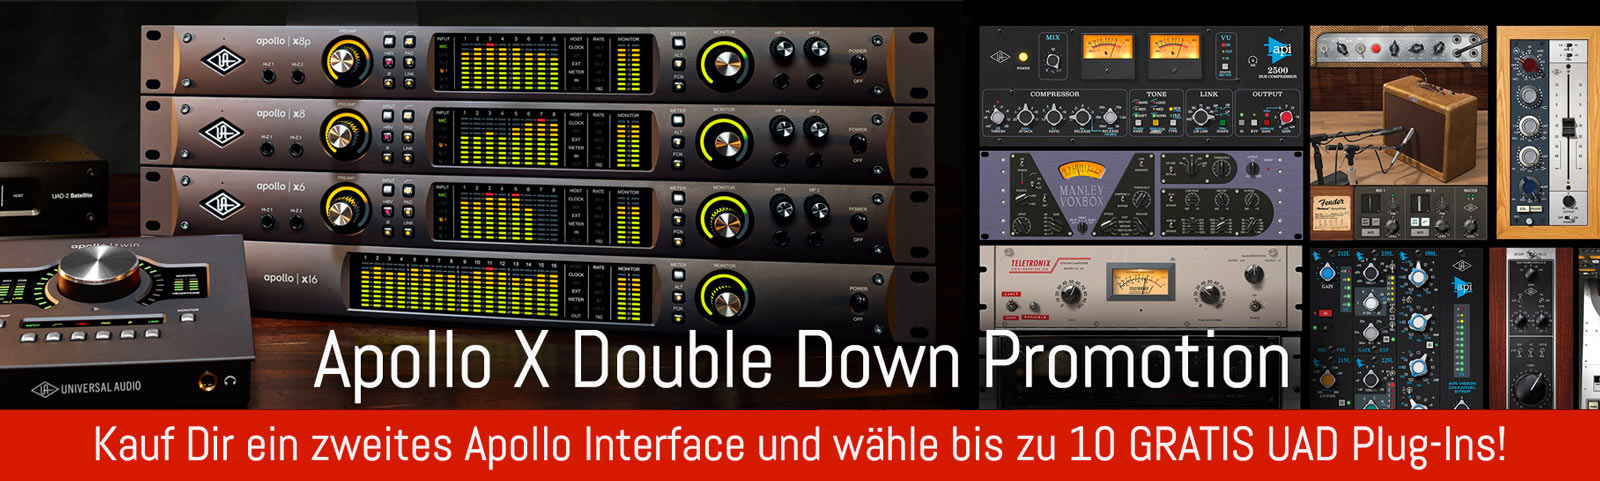 Universal Audio Apollo Twin MKII Quad | DV247 | en-GB